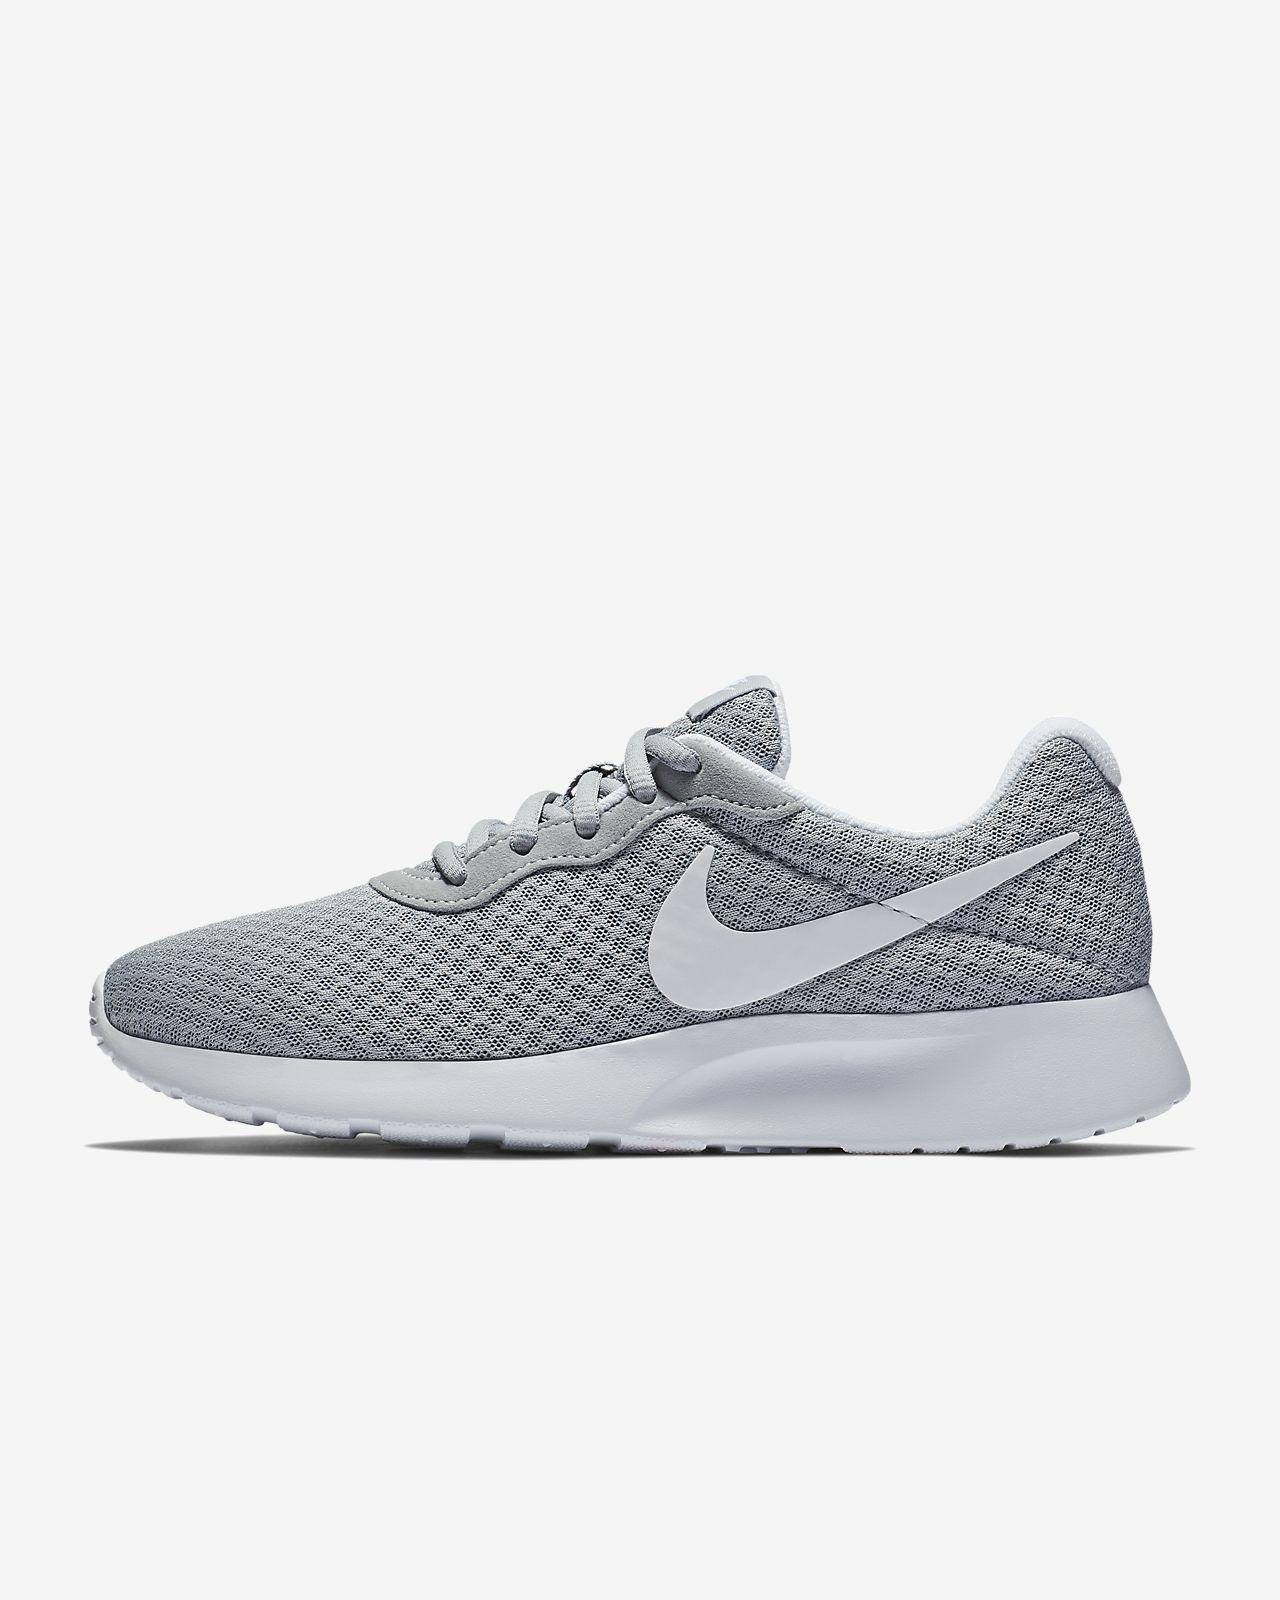 Женские кроссовки Nike Tanjun. Nike.com RU c567a6d44d